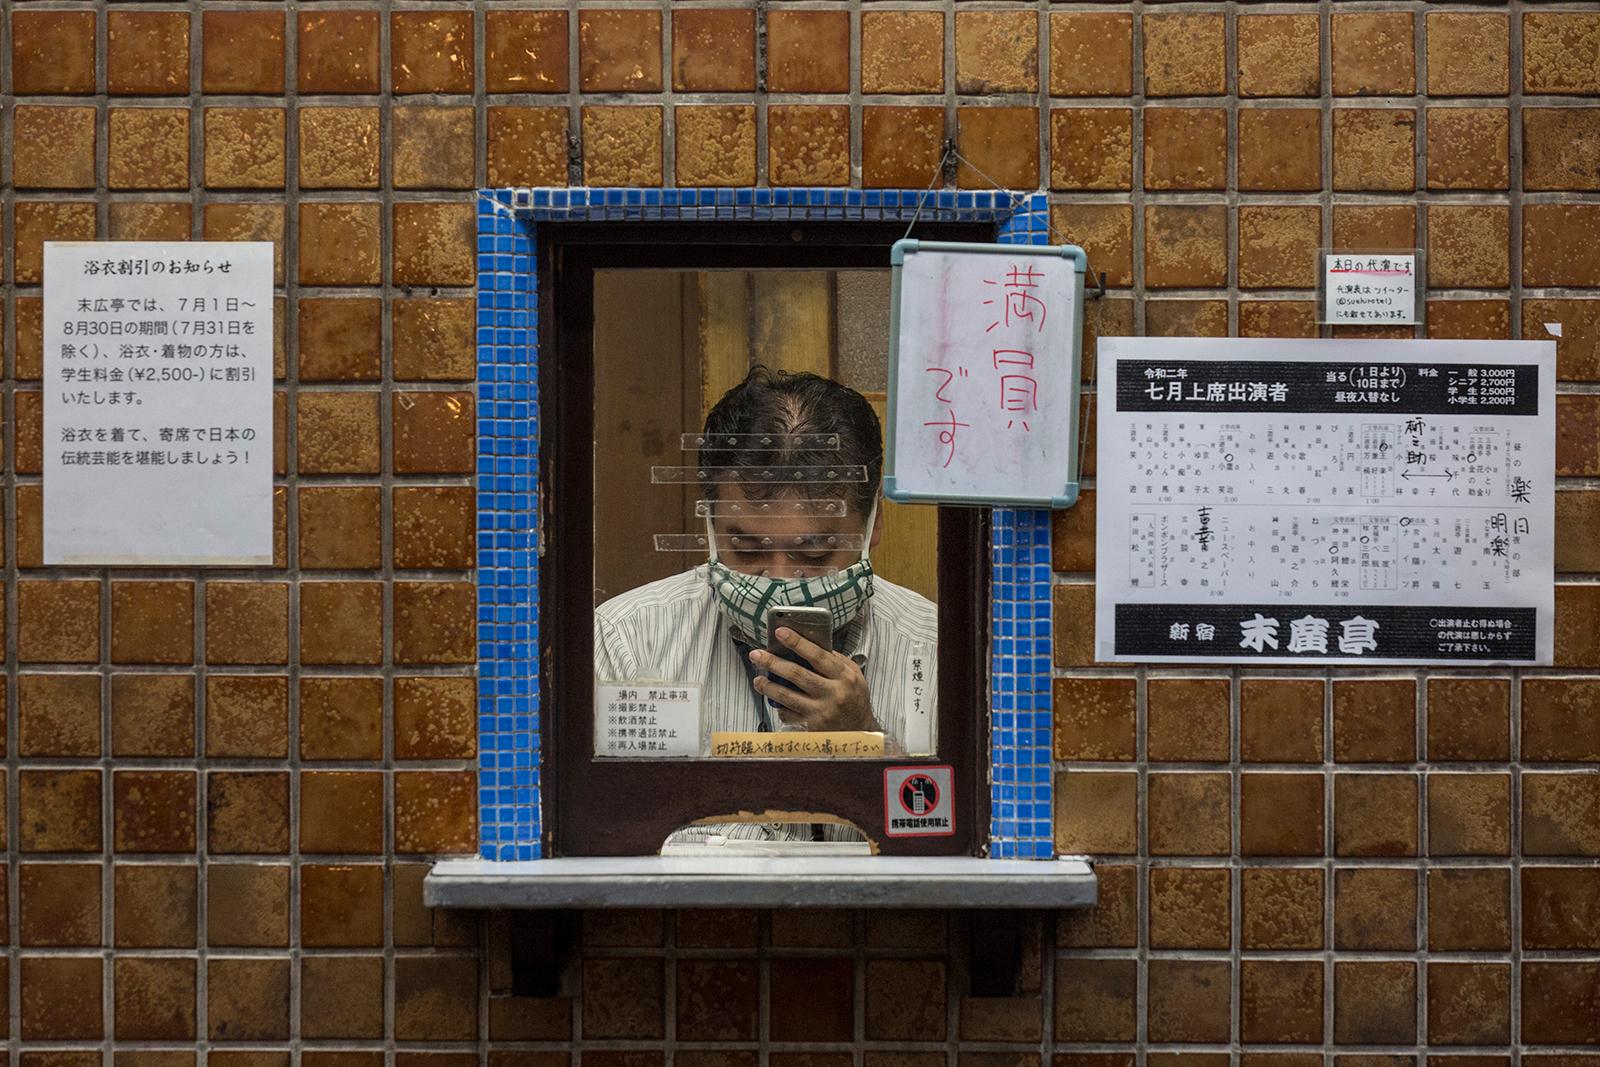 A ticket-clerk checks his phone at Yose theater Shinjuku-Suehirotei on July 10, in Tokyo.